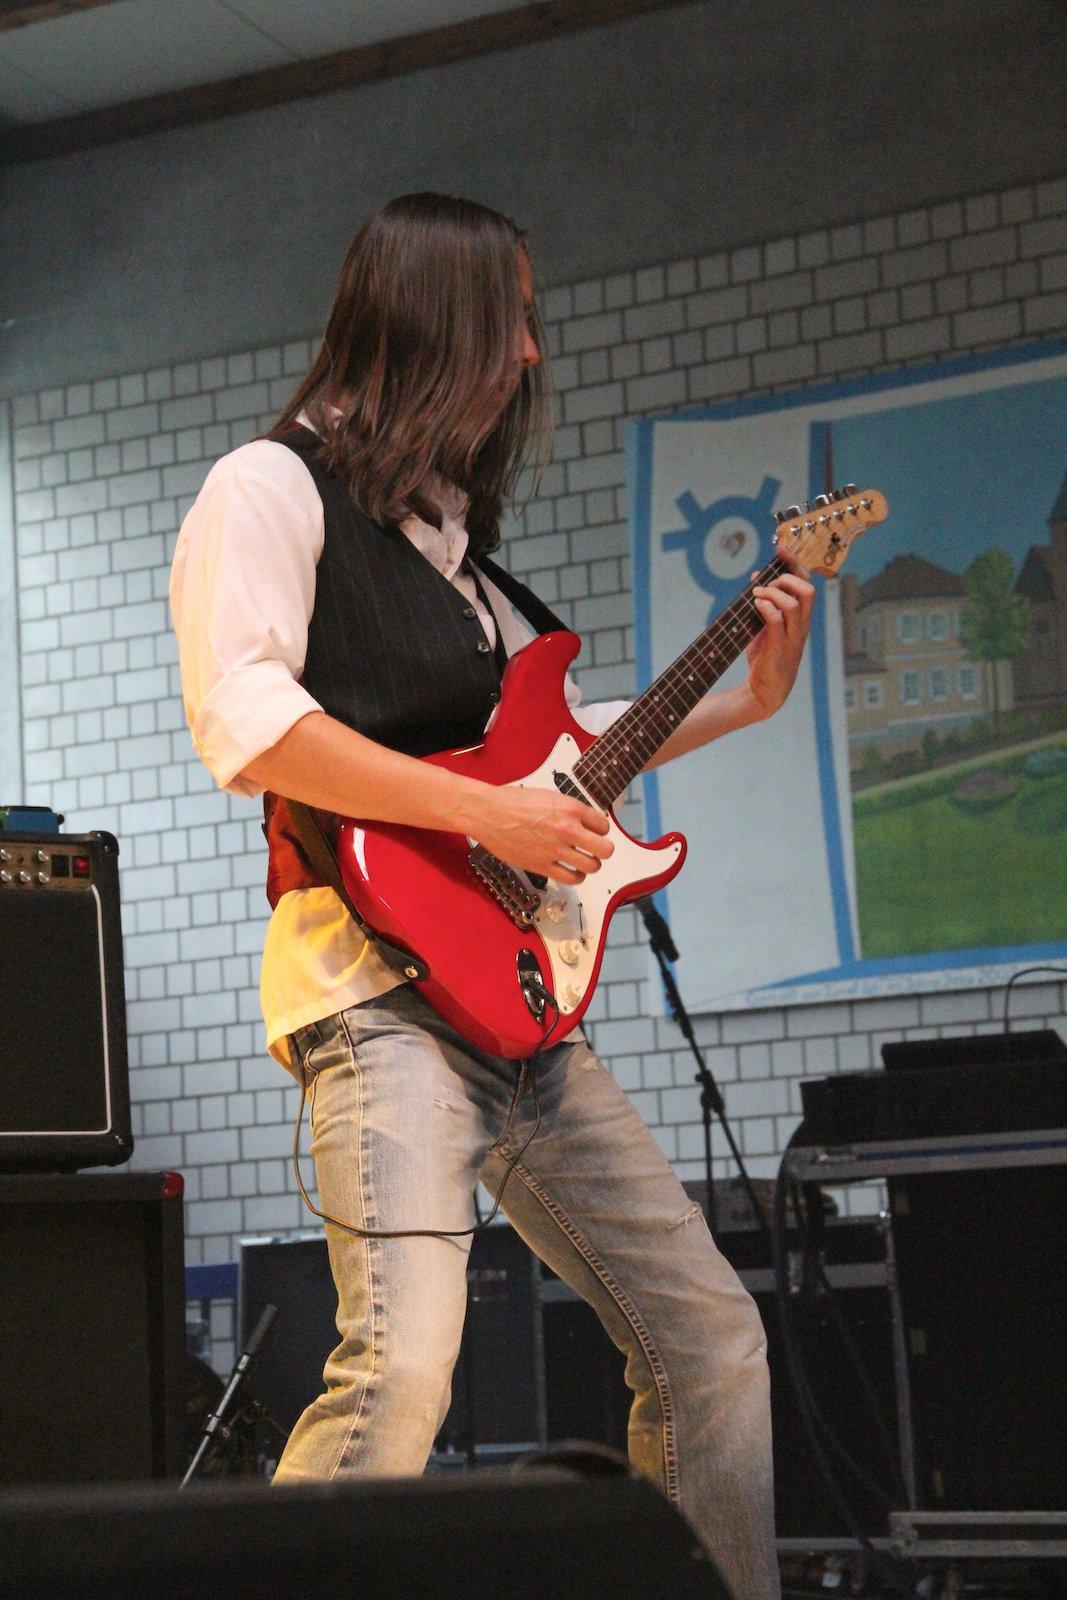 Stainless Quo - Sommerfesthalle, Otterstadt 18.06.2011 - 02